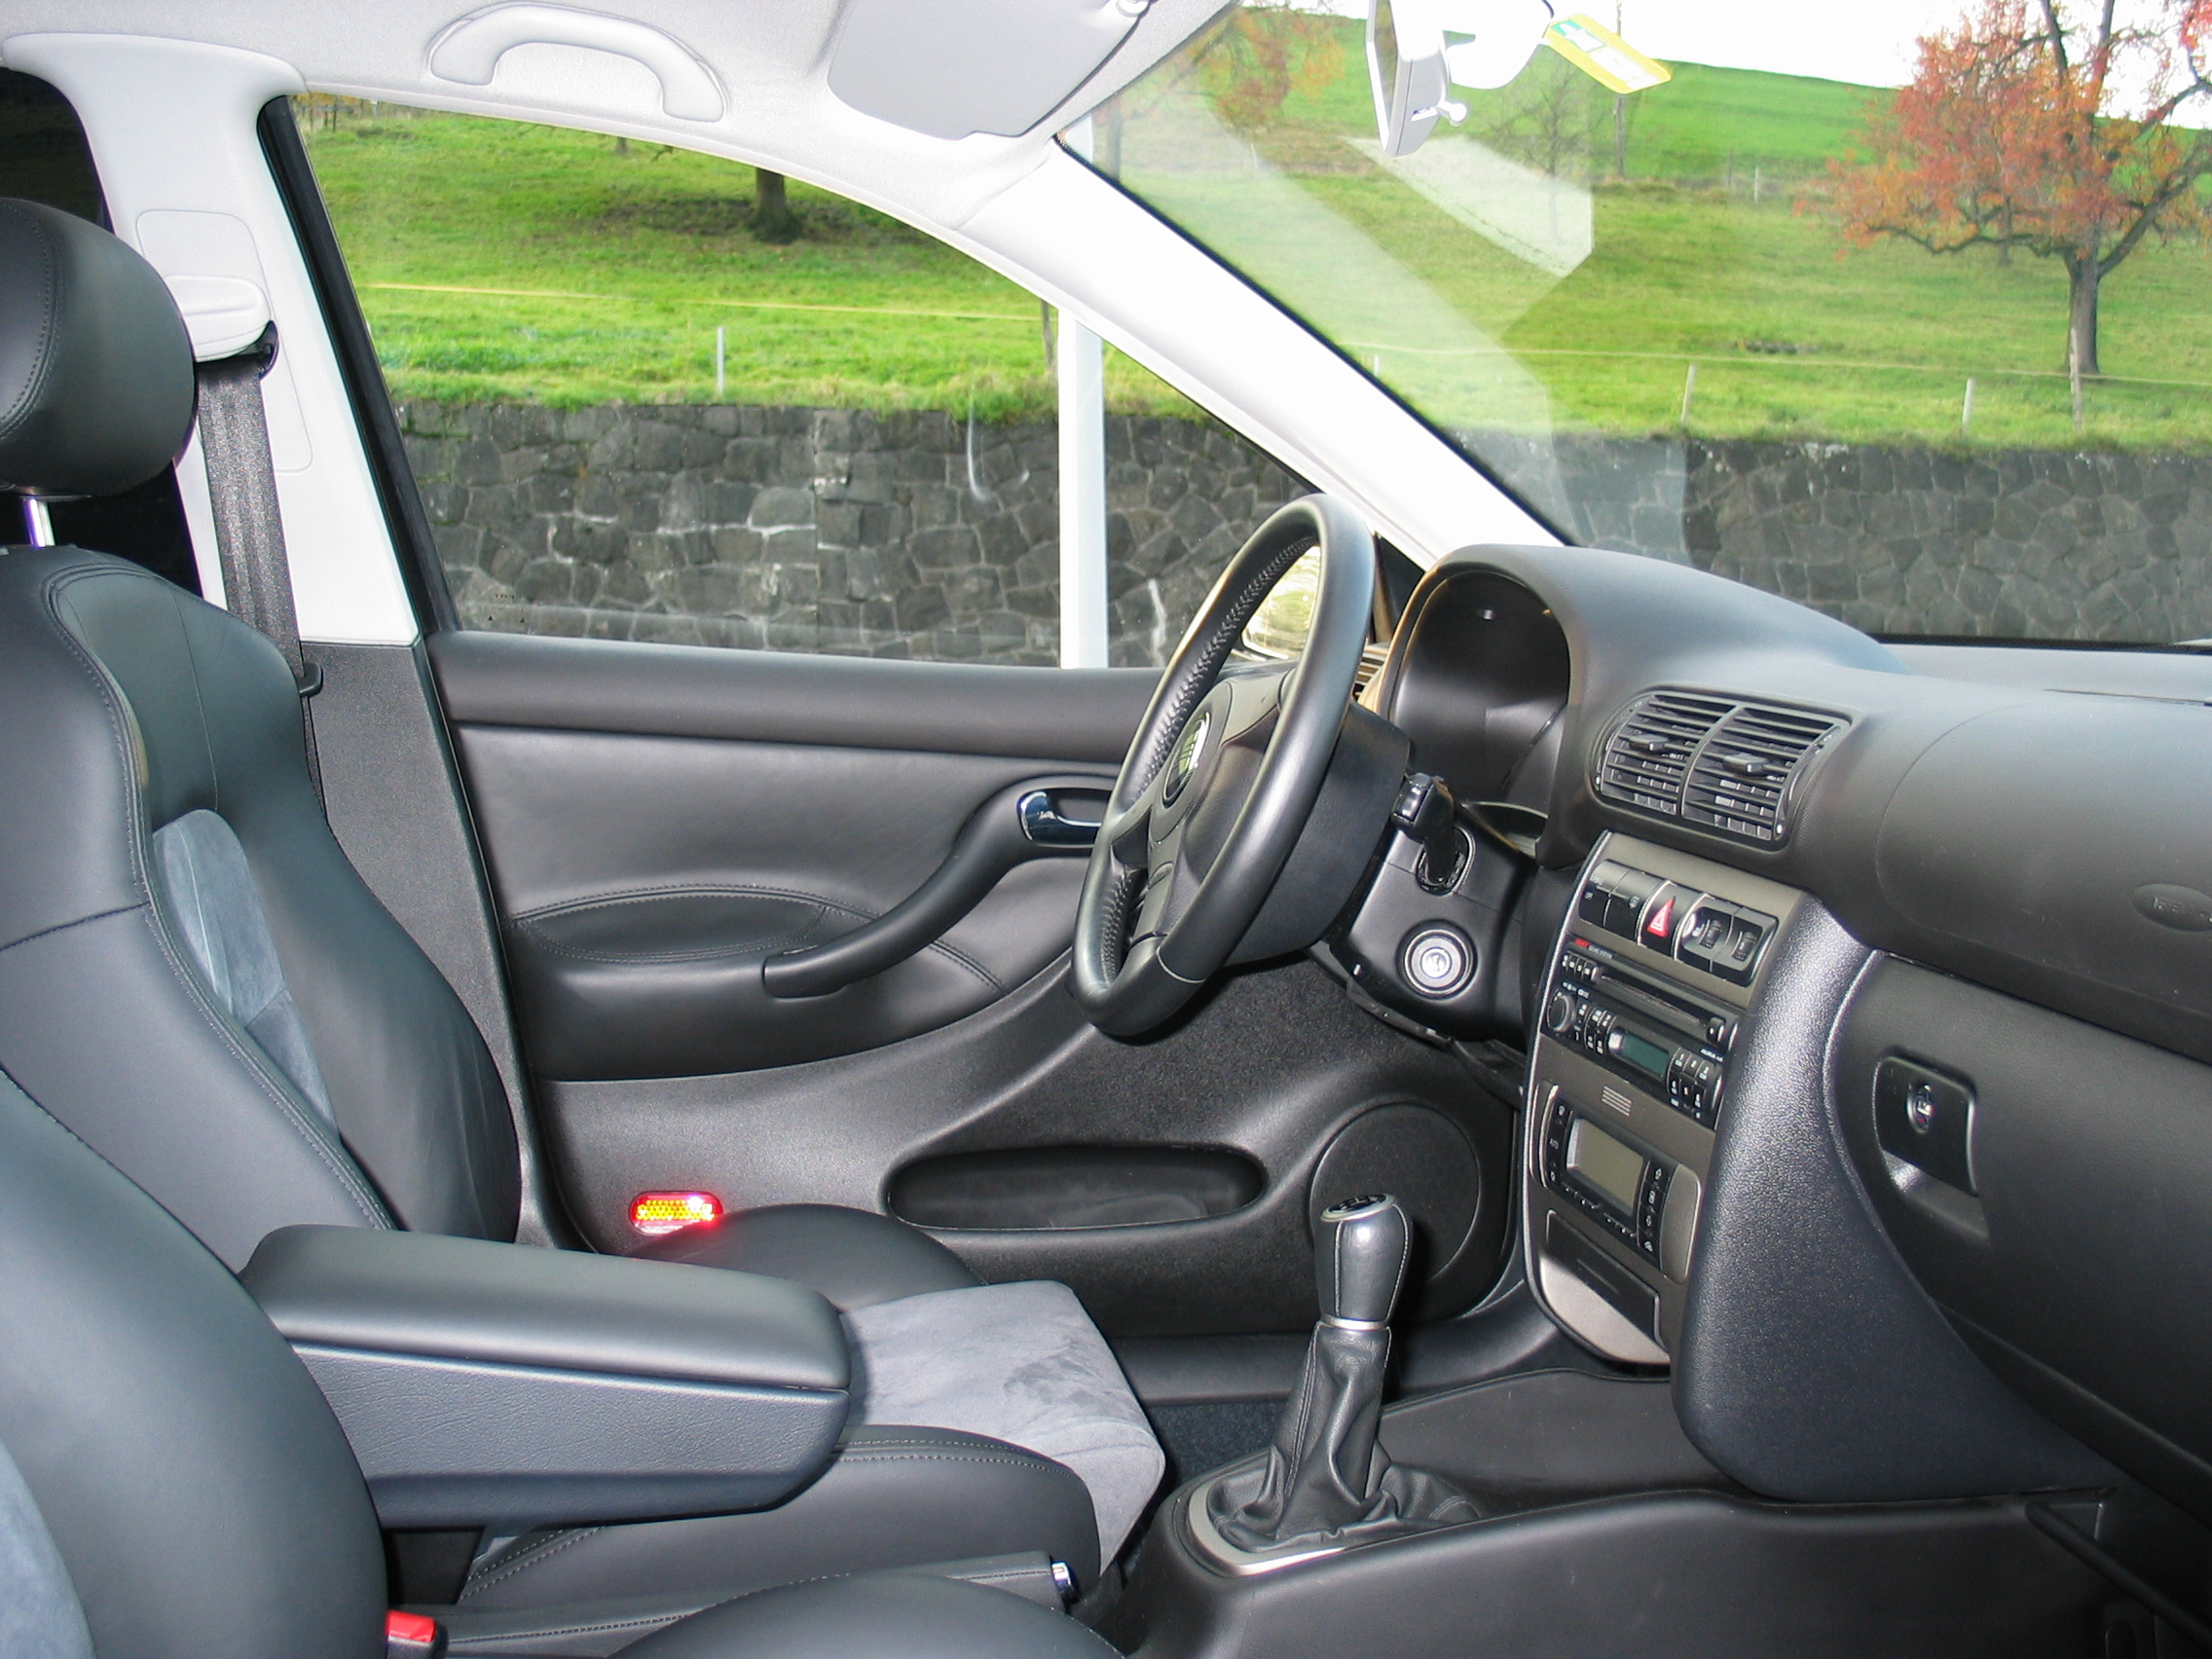 File:SEAT Leon Mk1 driver\'s seat left view.jpg - Wikimedia Commons